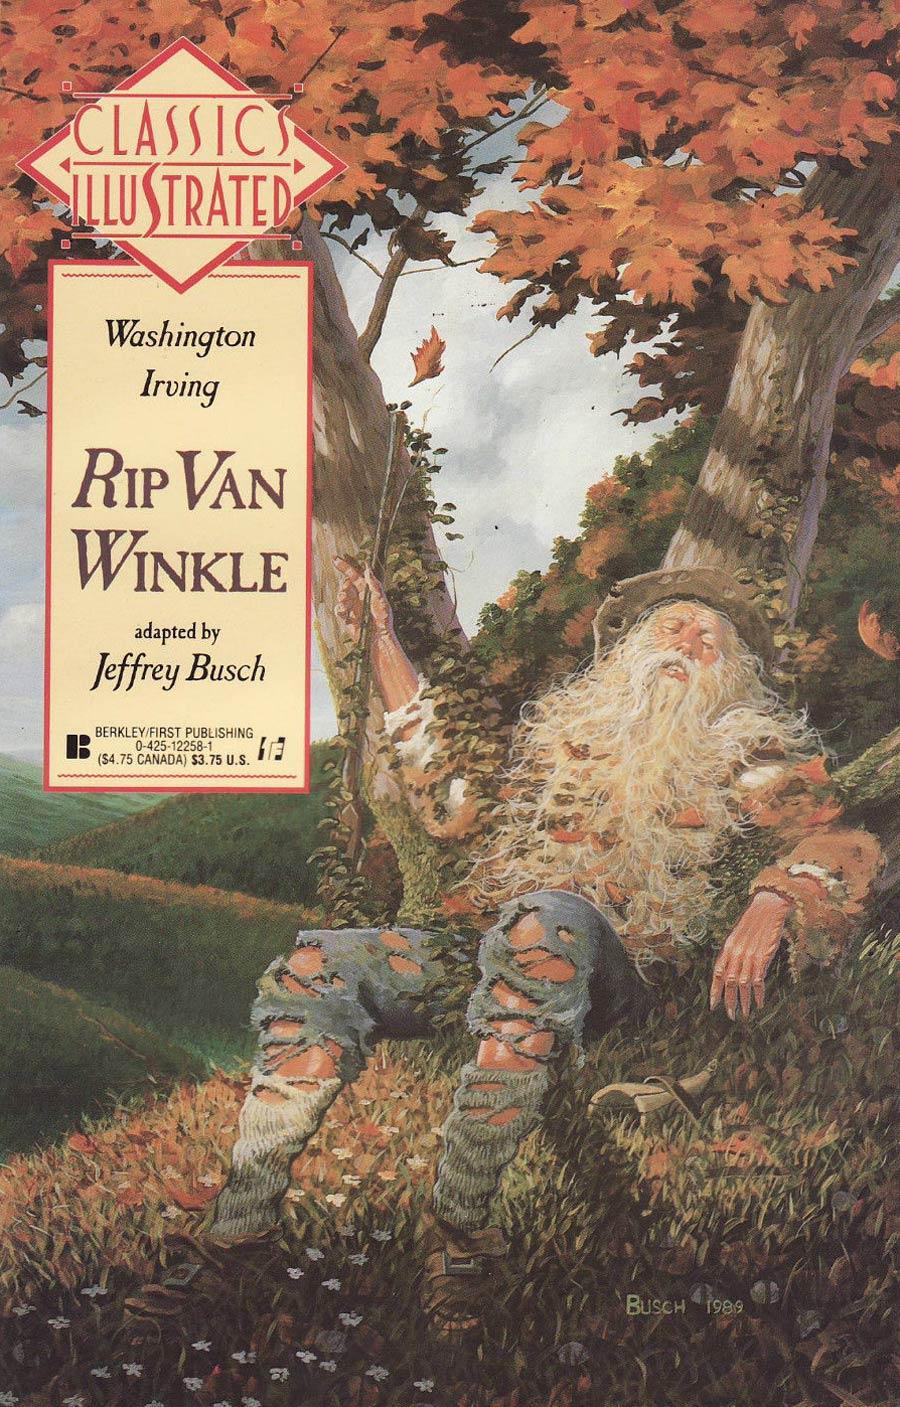 Classics Illustrated Vol 2 #11 Rip Van Winkle